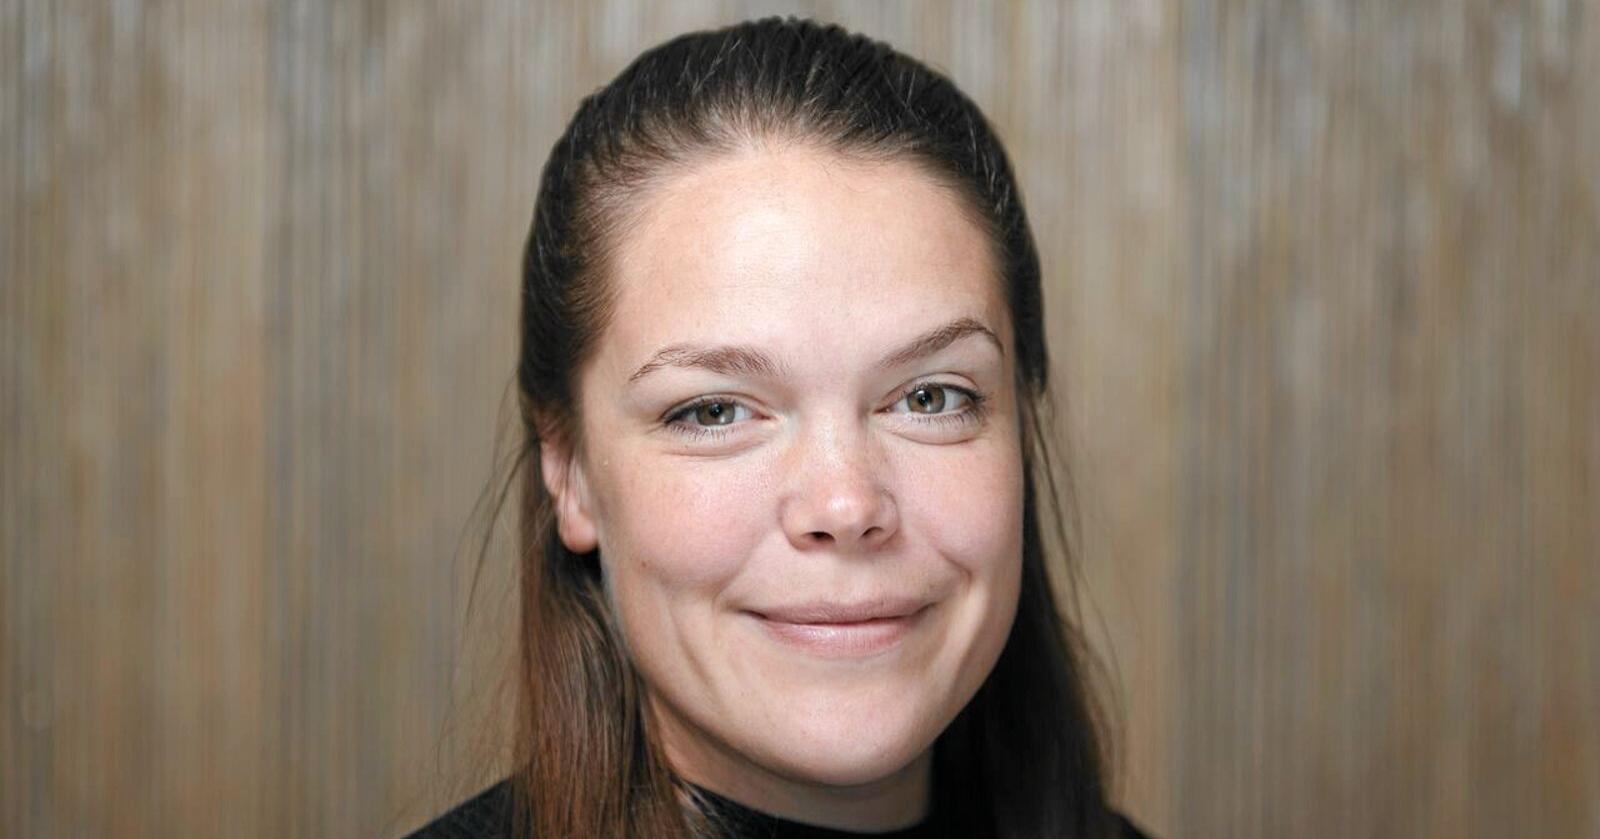 Vilde Haarsaker, ny assisterende generalsekretær i Norsk Bonde- og Småbrukarlaget. Foto: Småbrukarlaget